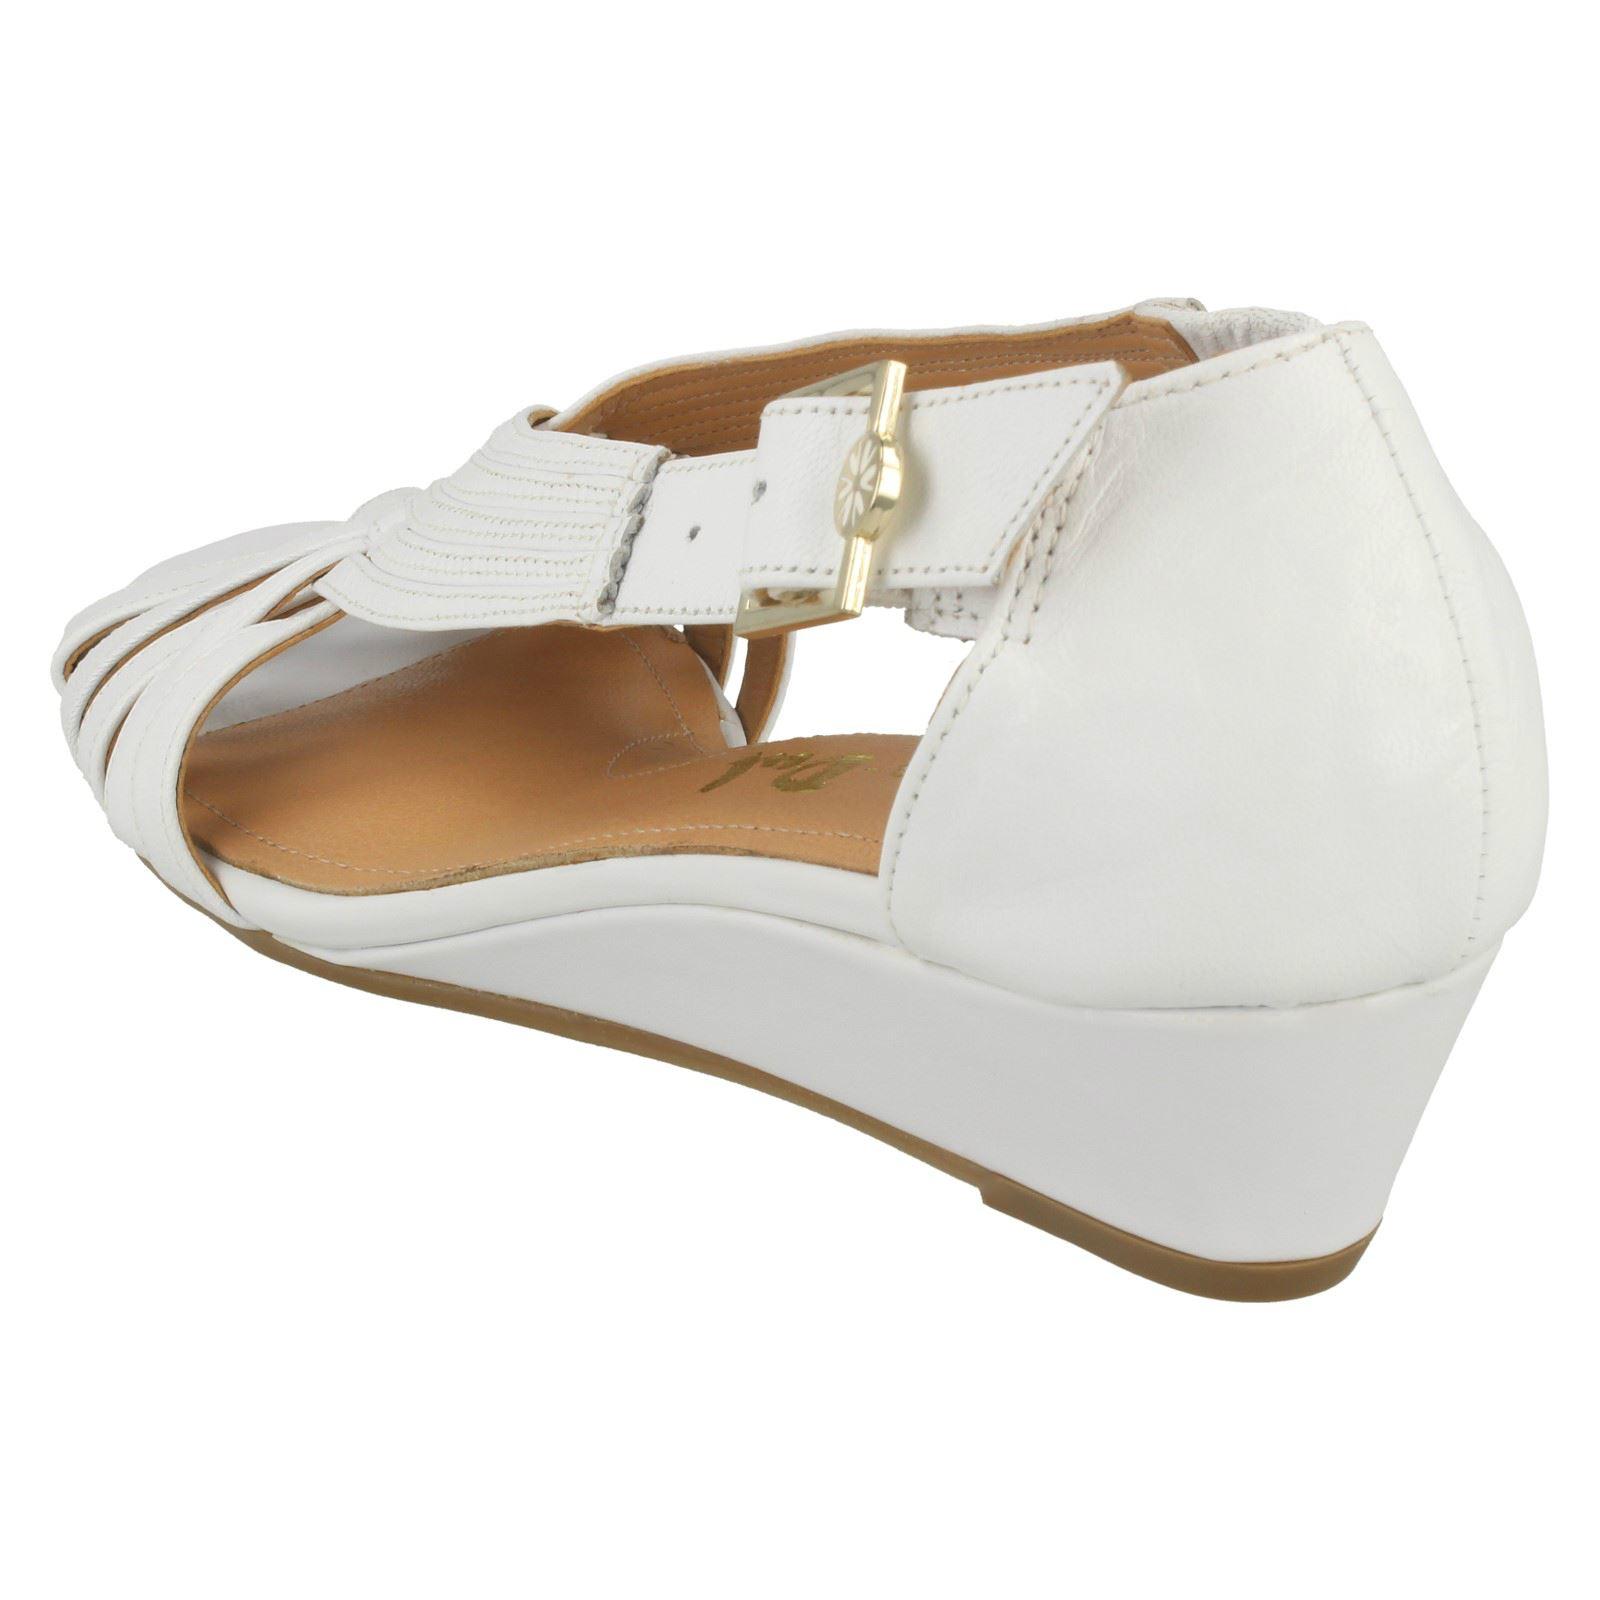 Ladies-Van-Dal-Wedge-Strappy-Sandals-Lucie thumbnail 15